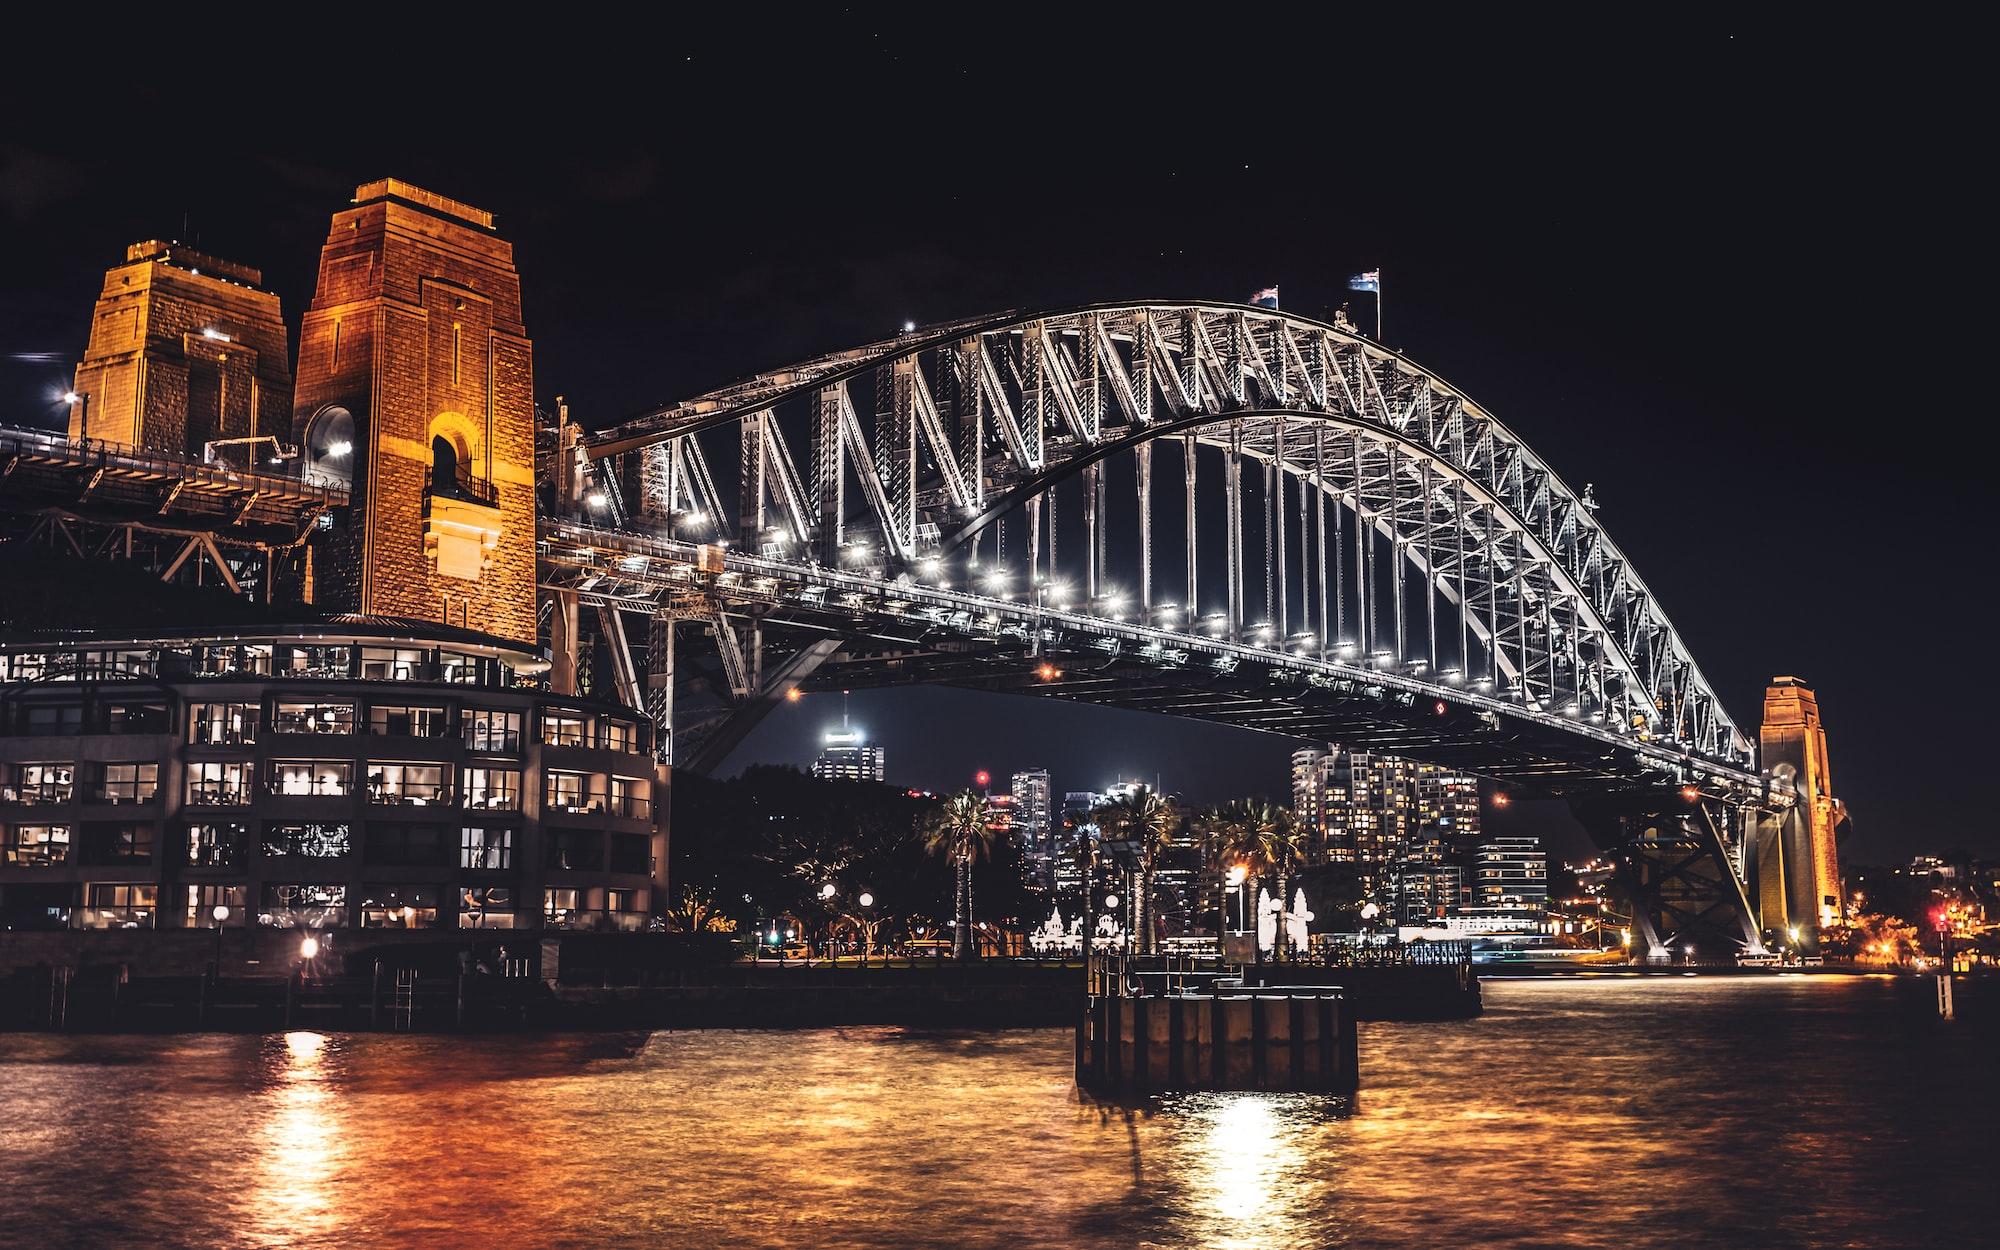 Epic bridge at night. Sydney.